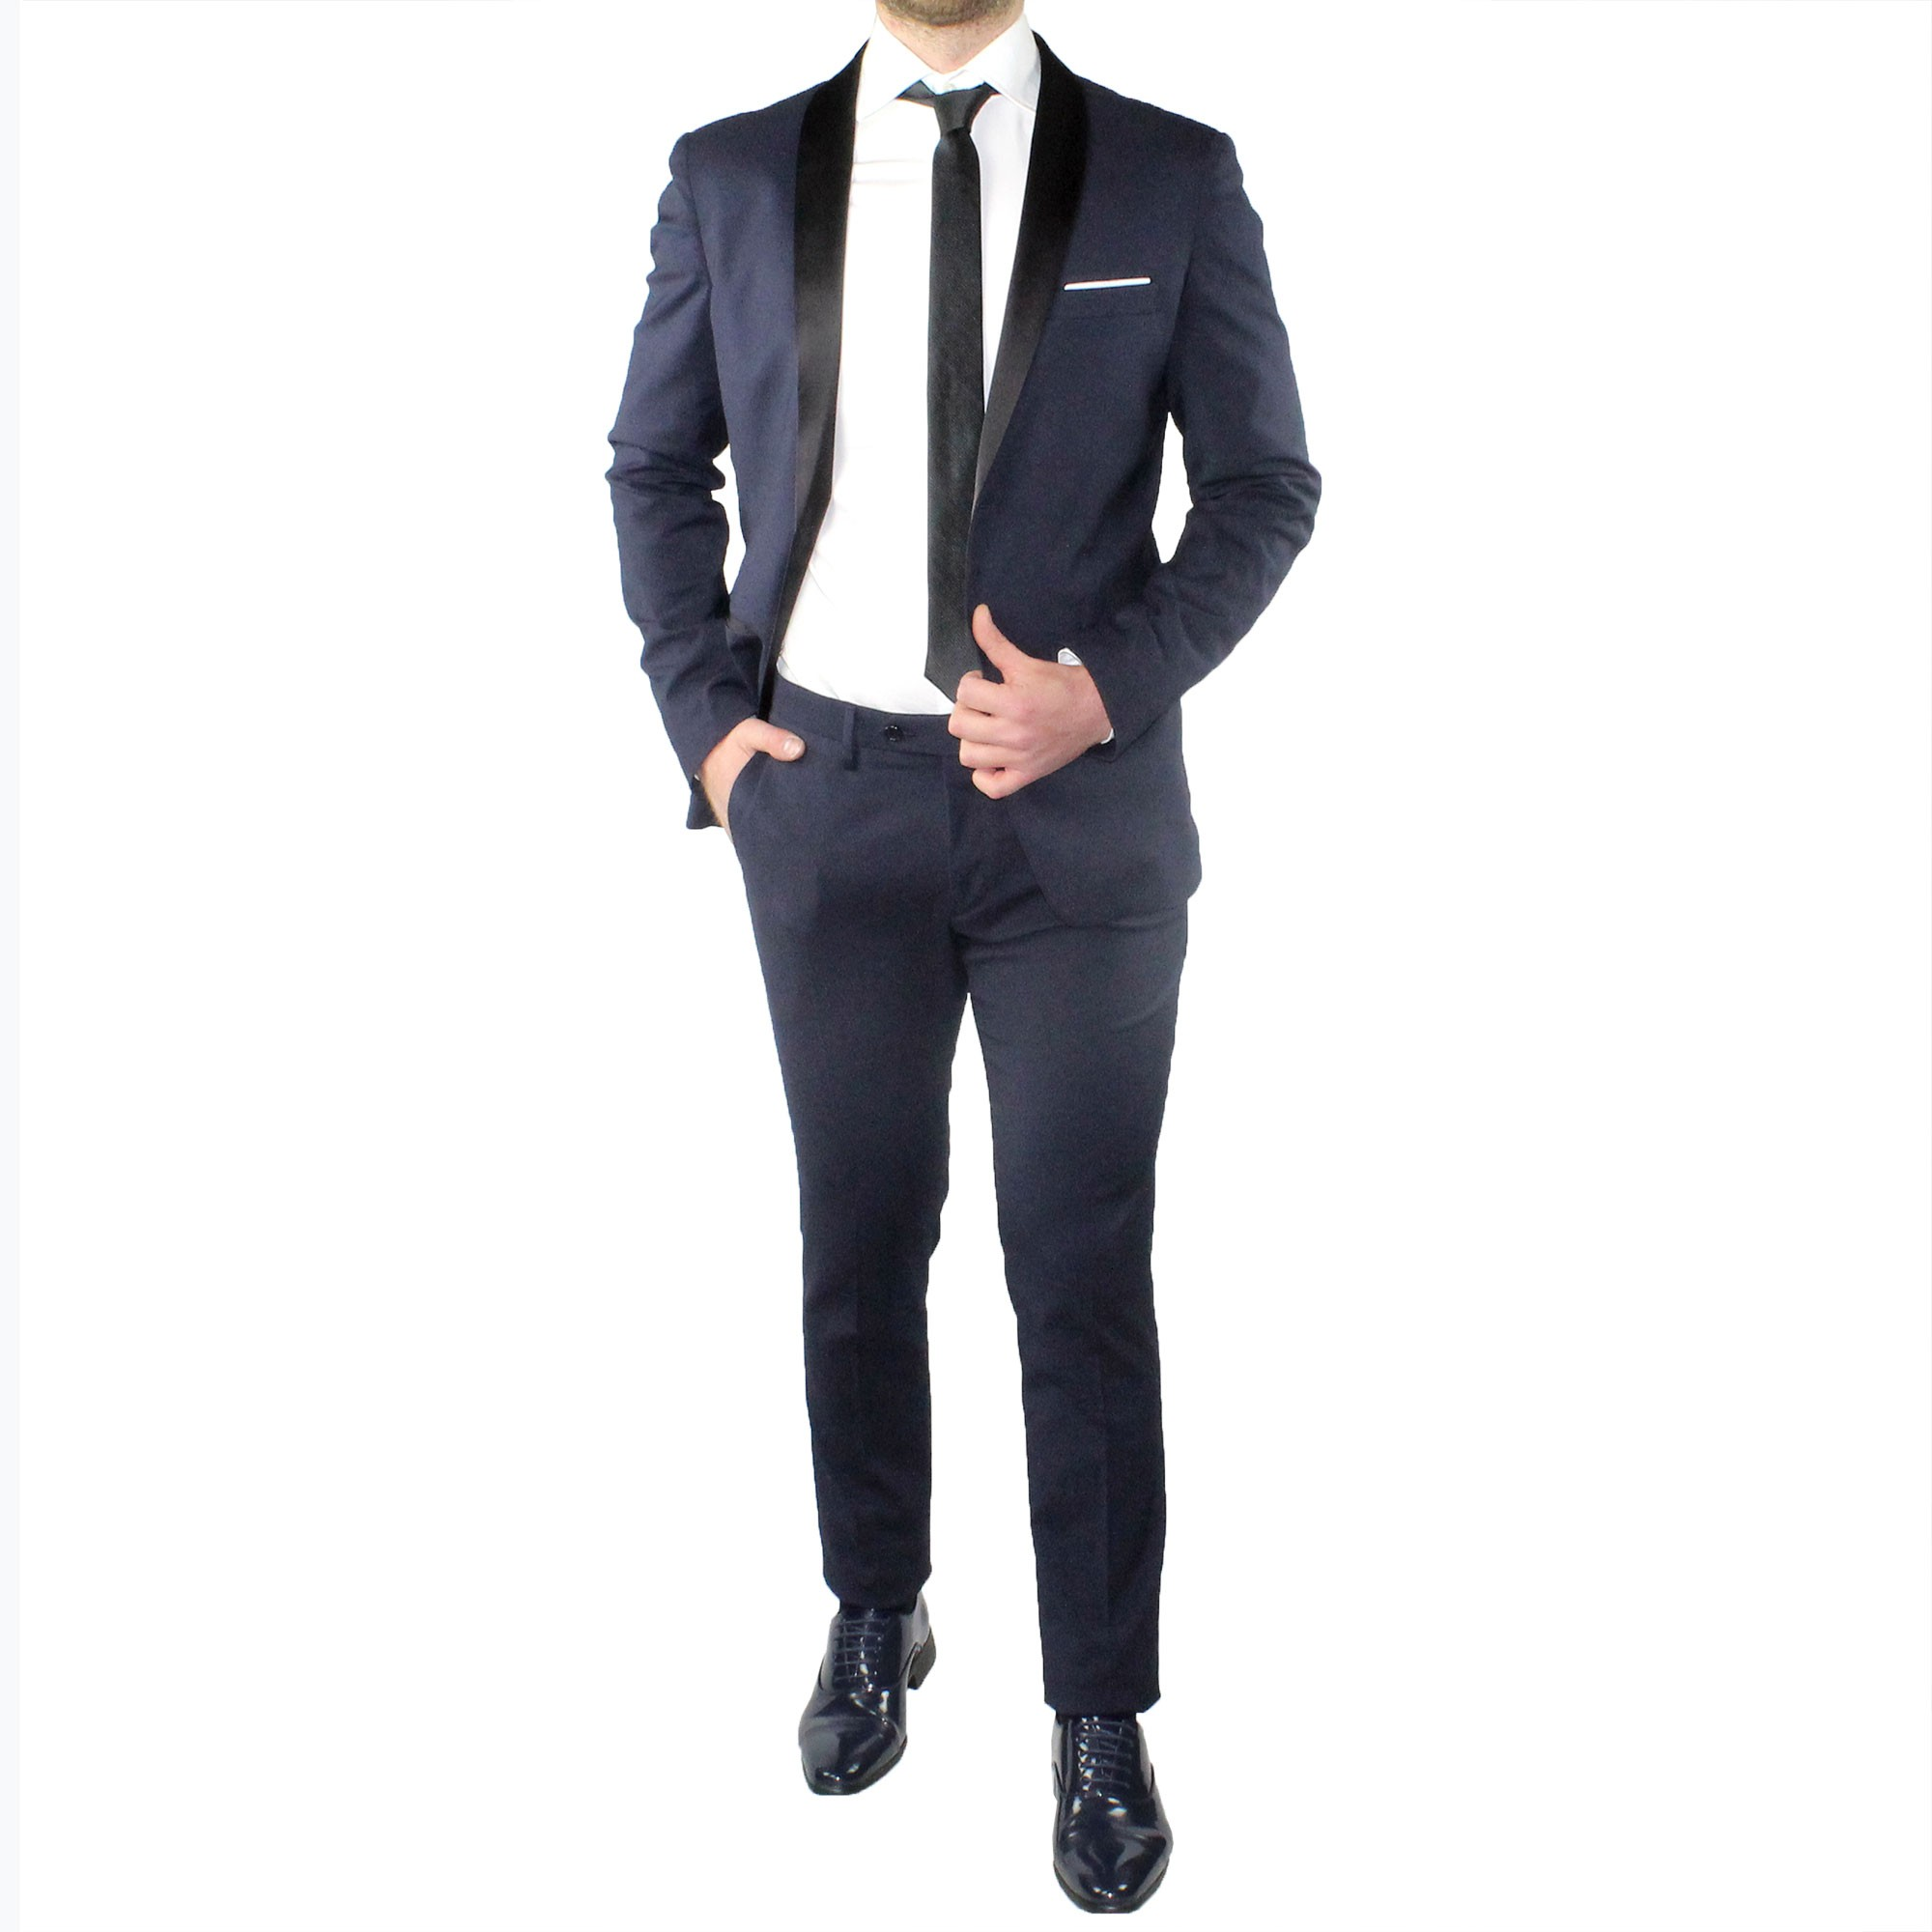 Abito-Uomo-Smoking-Elegante-Vestito-Completo-Estivo-Cerimonia-Sartoriale-Slim miniatura 3